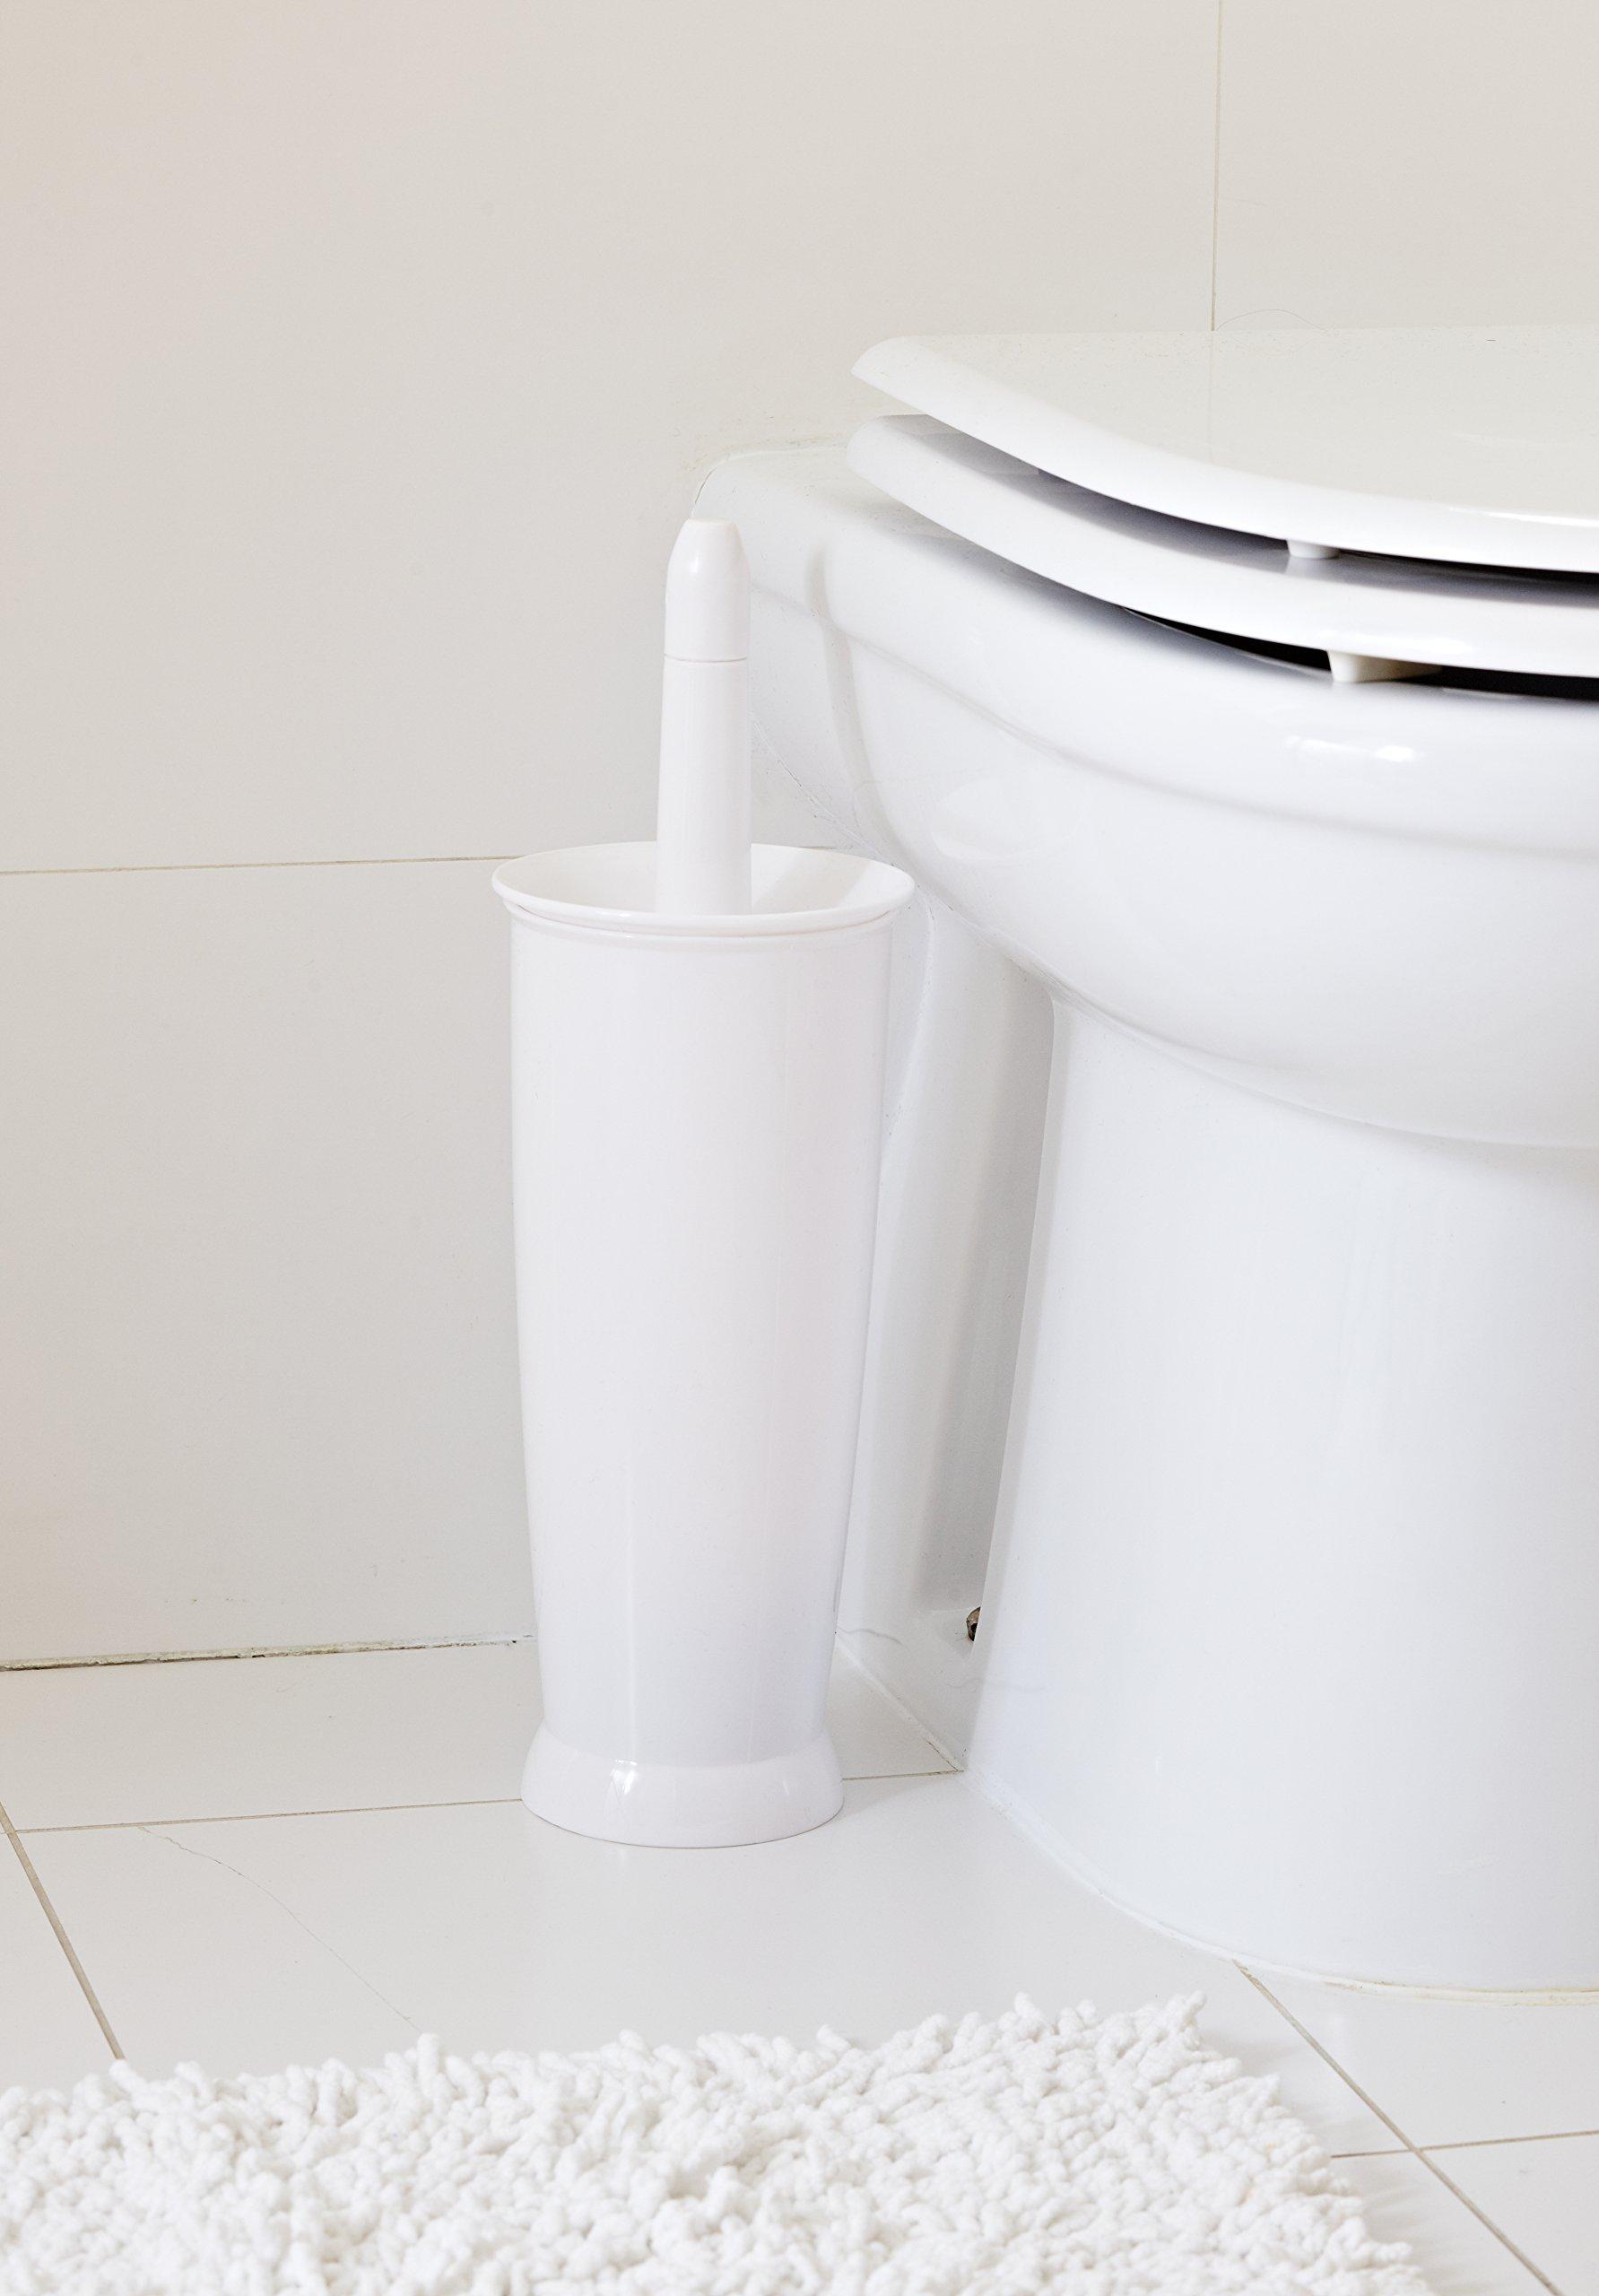 Addis Closed White Plastic Bathroom Toilet Brush And Holder Set ...